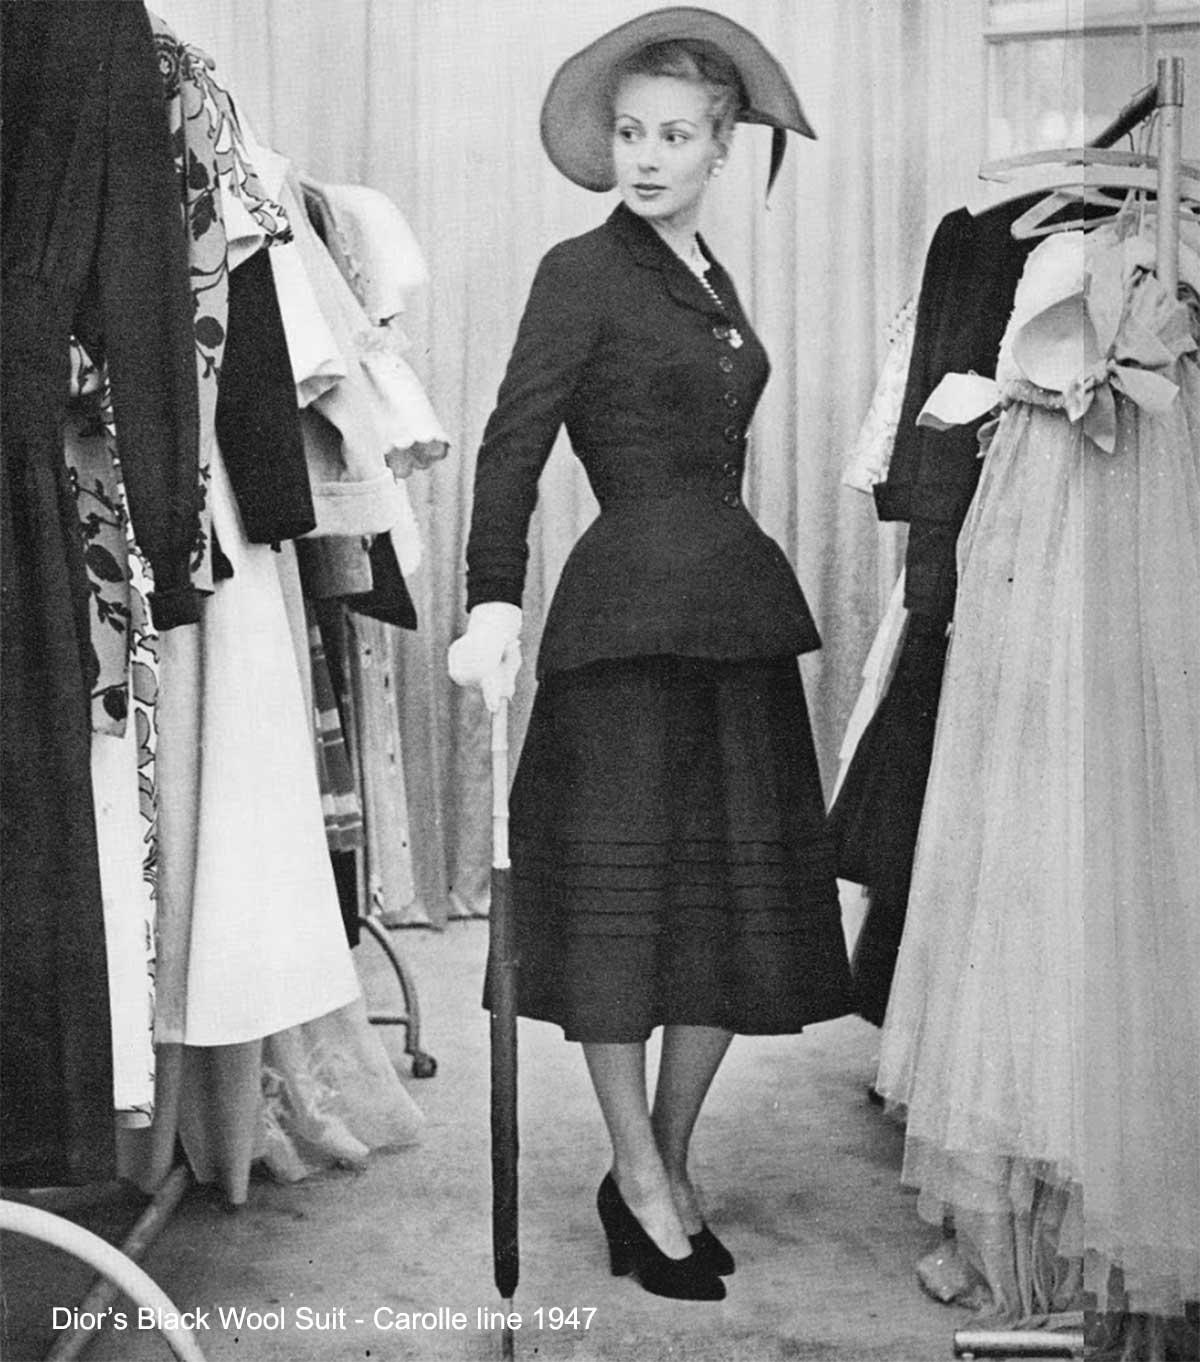 Dior-Black-Wool-Suit-Carolle-line-1947